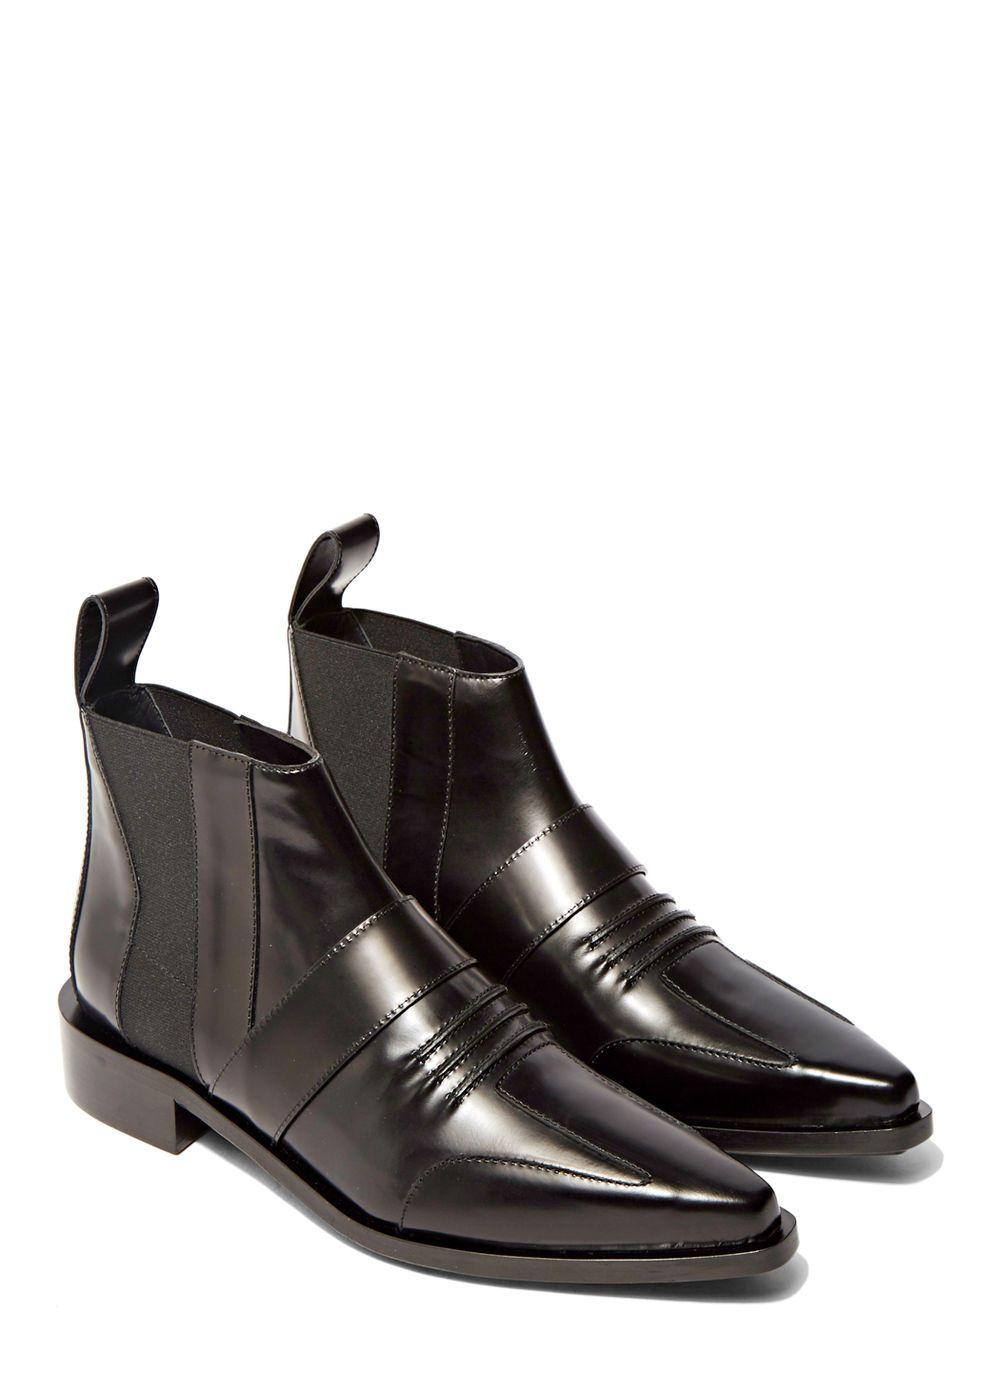 100% Original Cheap Online FOOTWEAR - Loafers Paco Rabanne Cheap Price Pre Order X0F2QQm